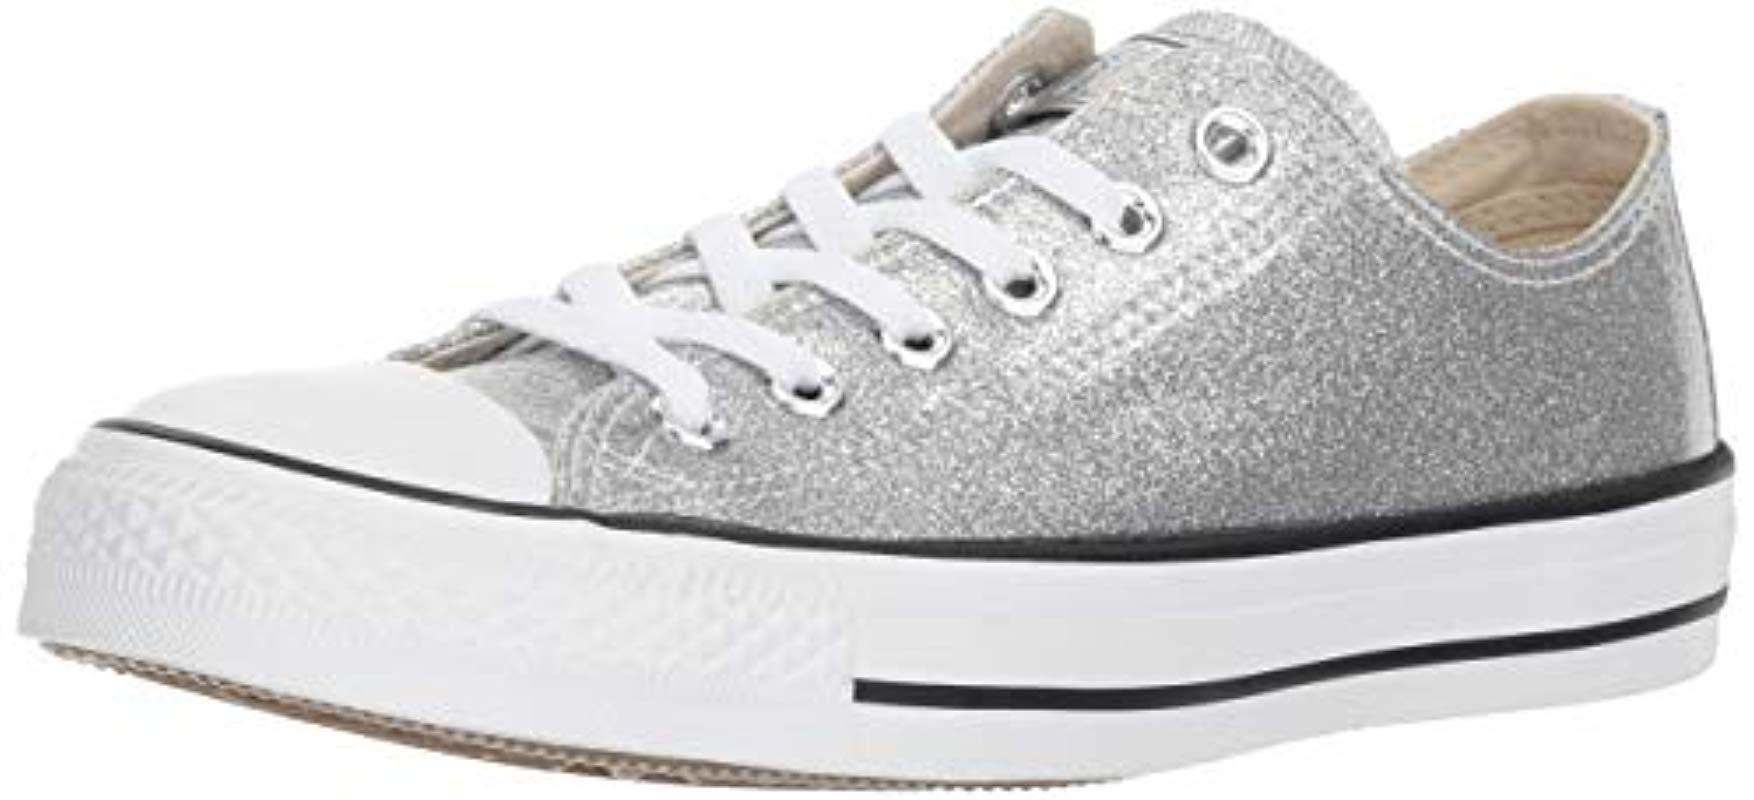 e181efe16814 Converse. Women s Metallic Chuck Taylor All Star Glitter Canvas Low Top  Sneaker